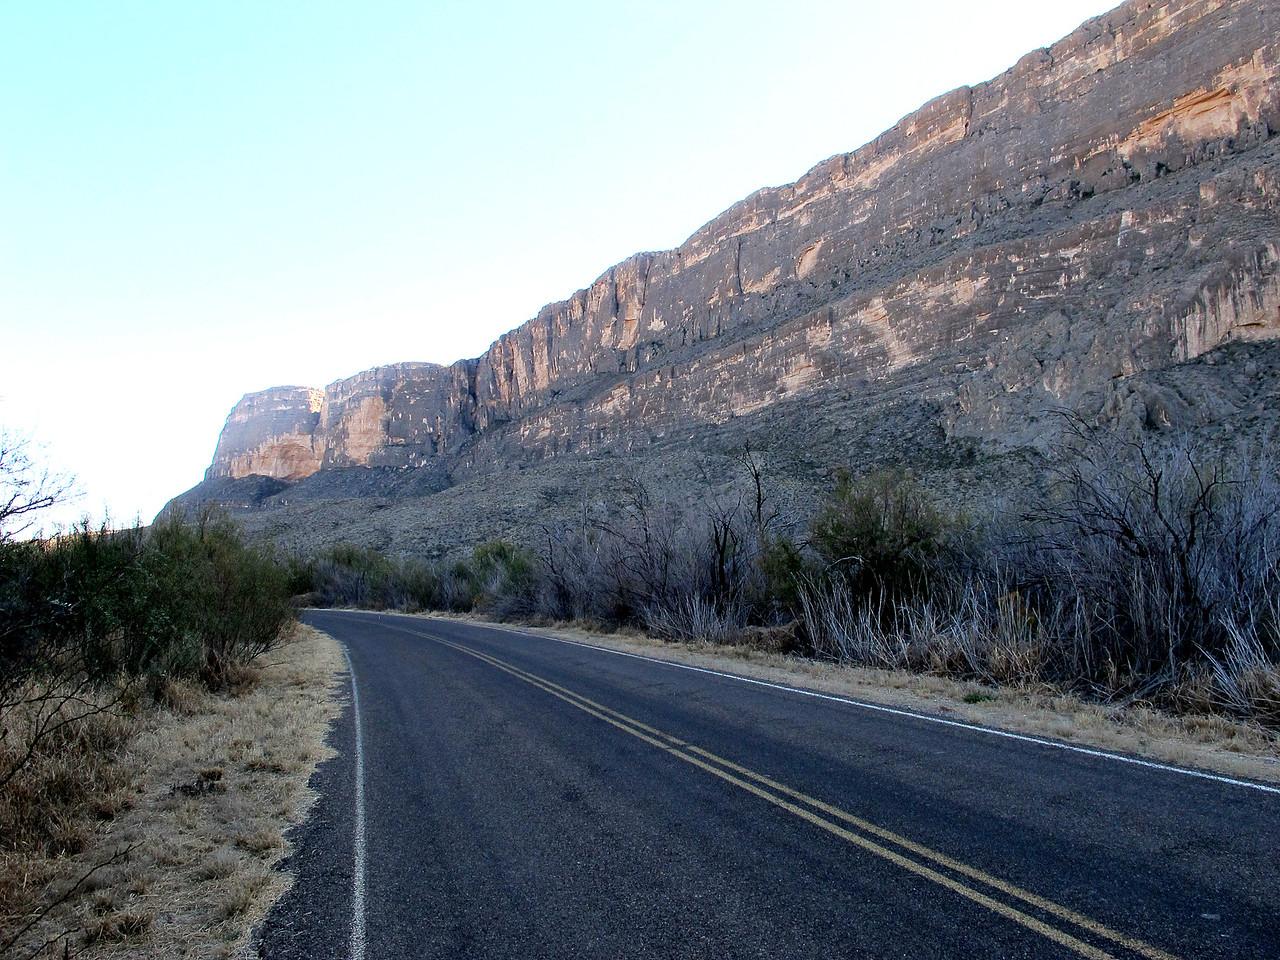 Santa Elena Canyon. I've never seen a mountain 'wall' like this one.